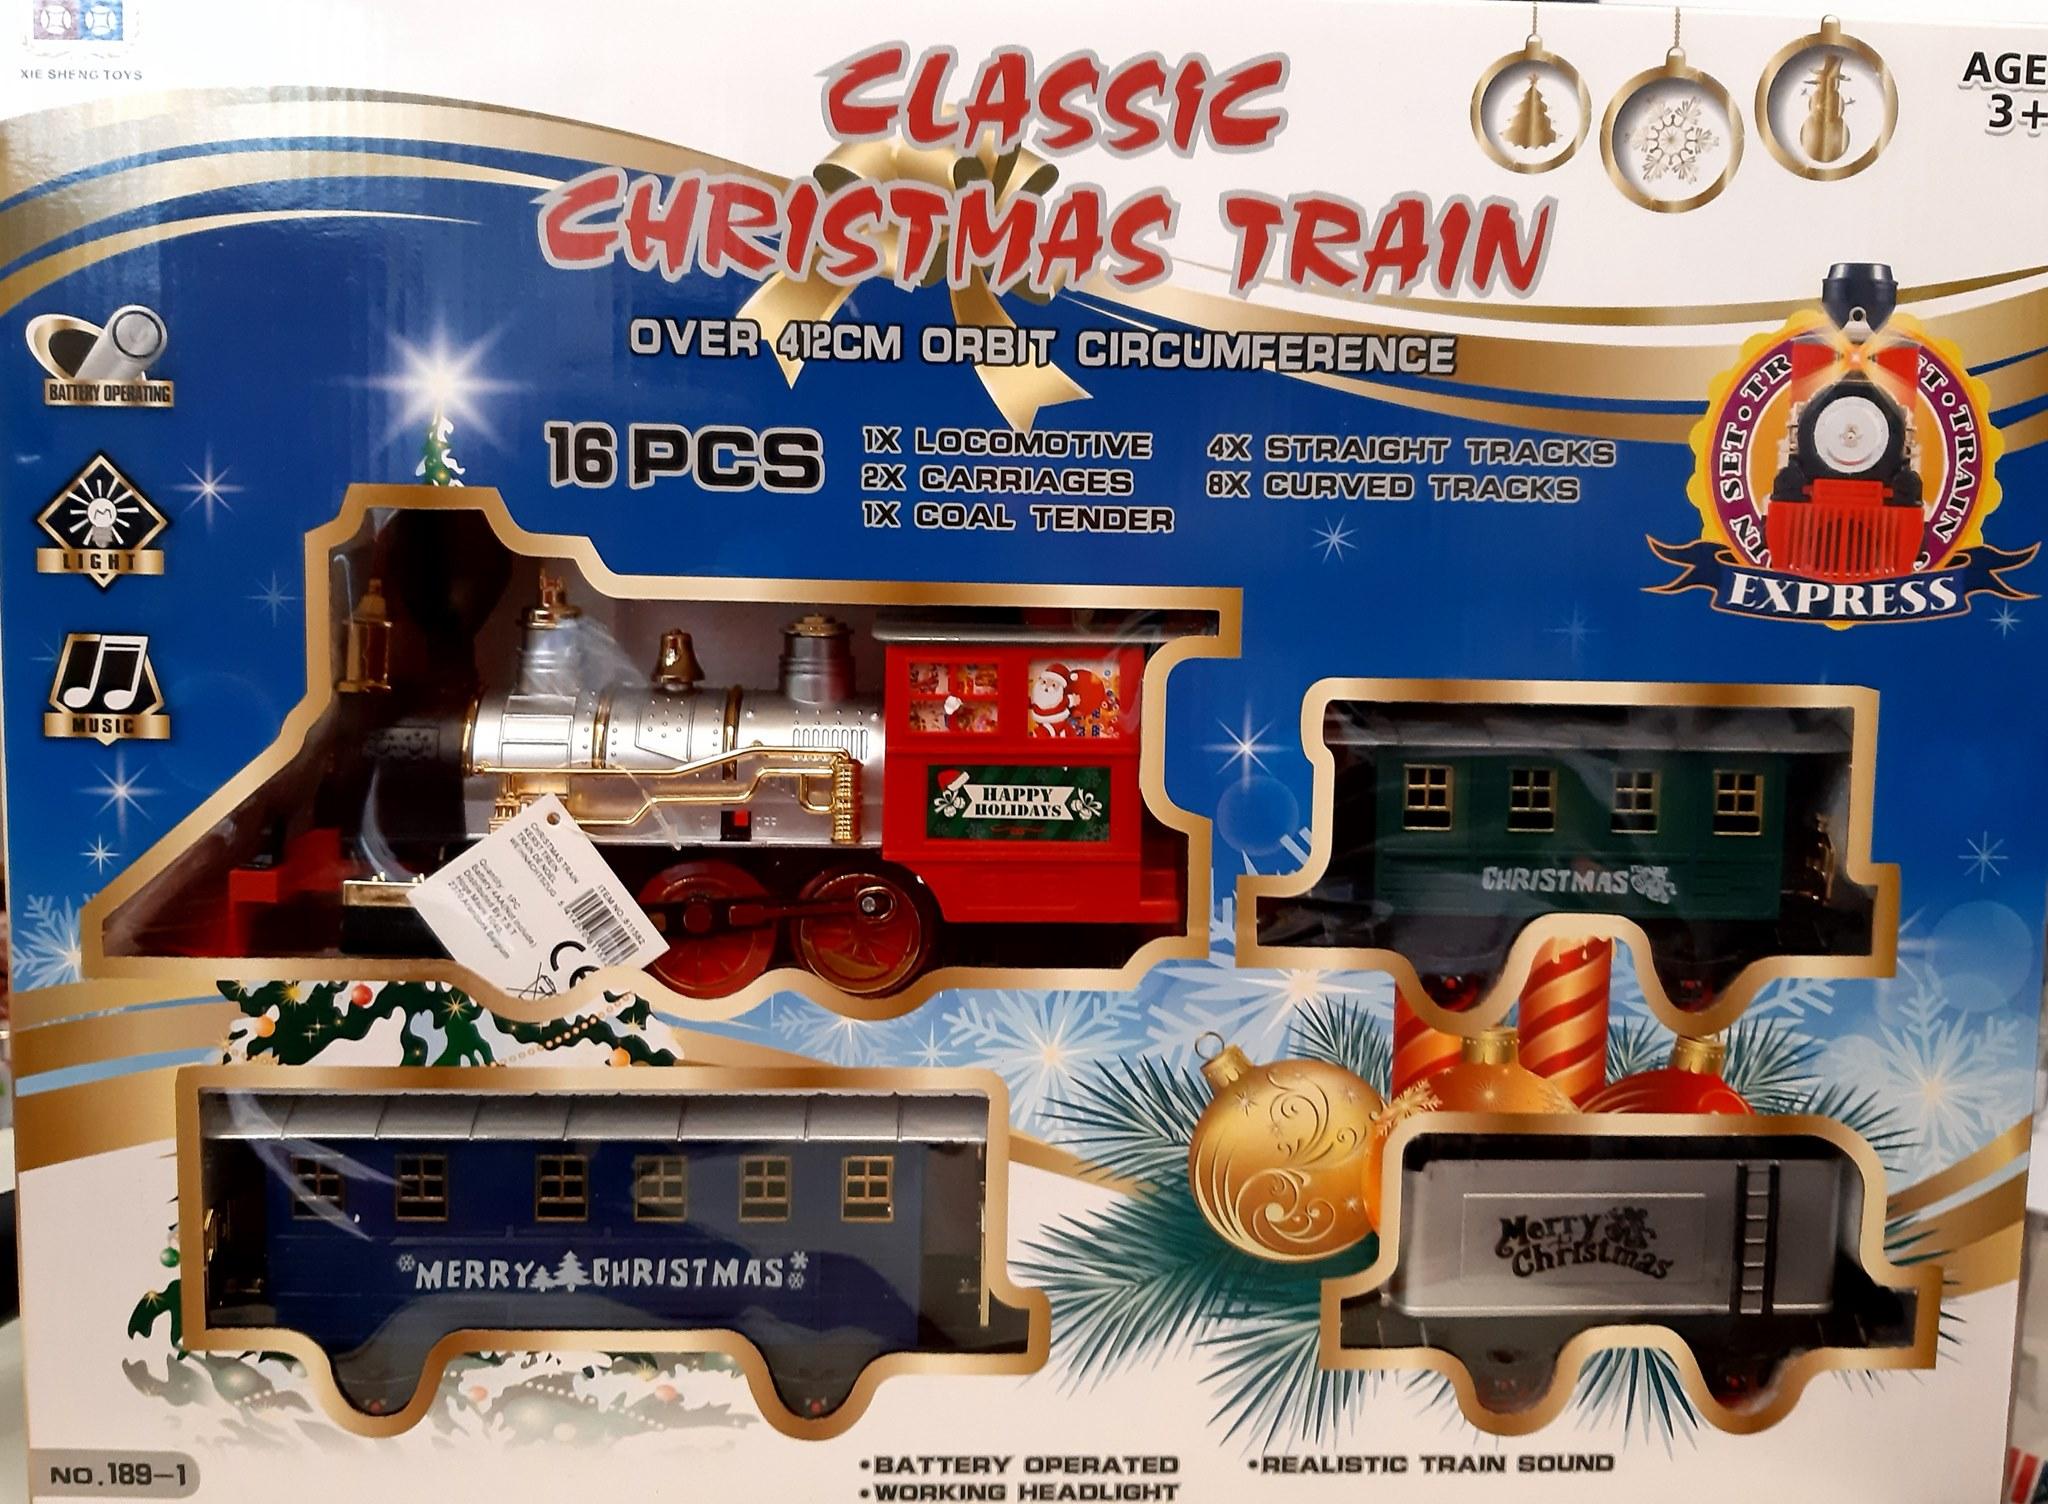 CLASSIC CHRISTMAS TRAIN 16 PCS OVER 412CM 811582